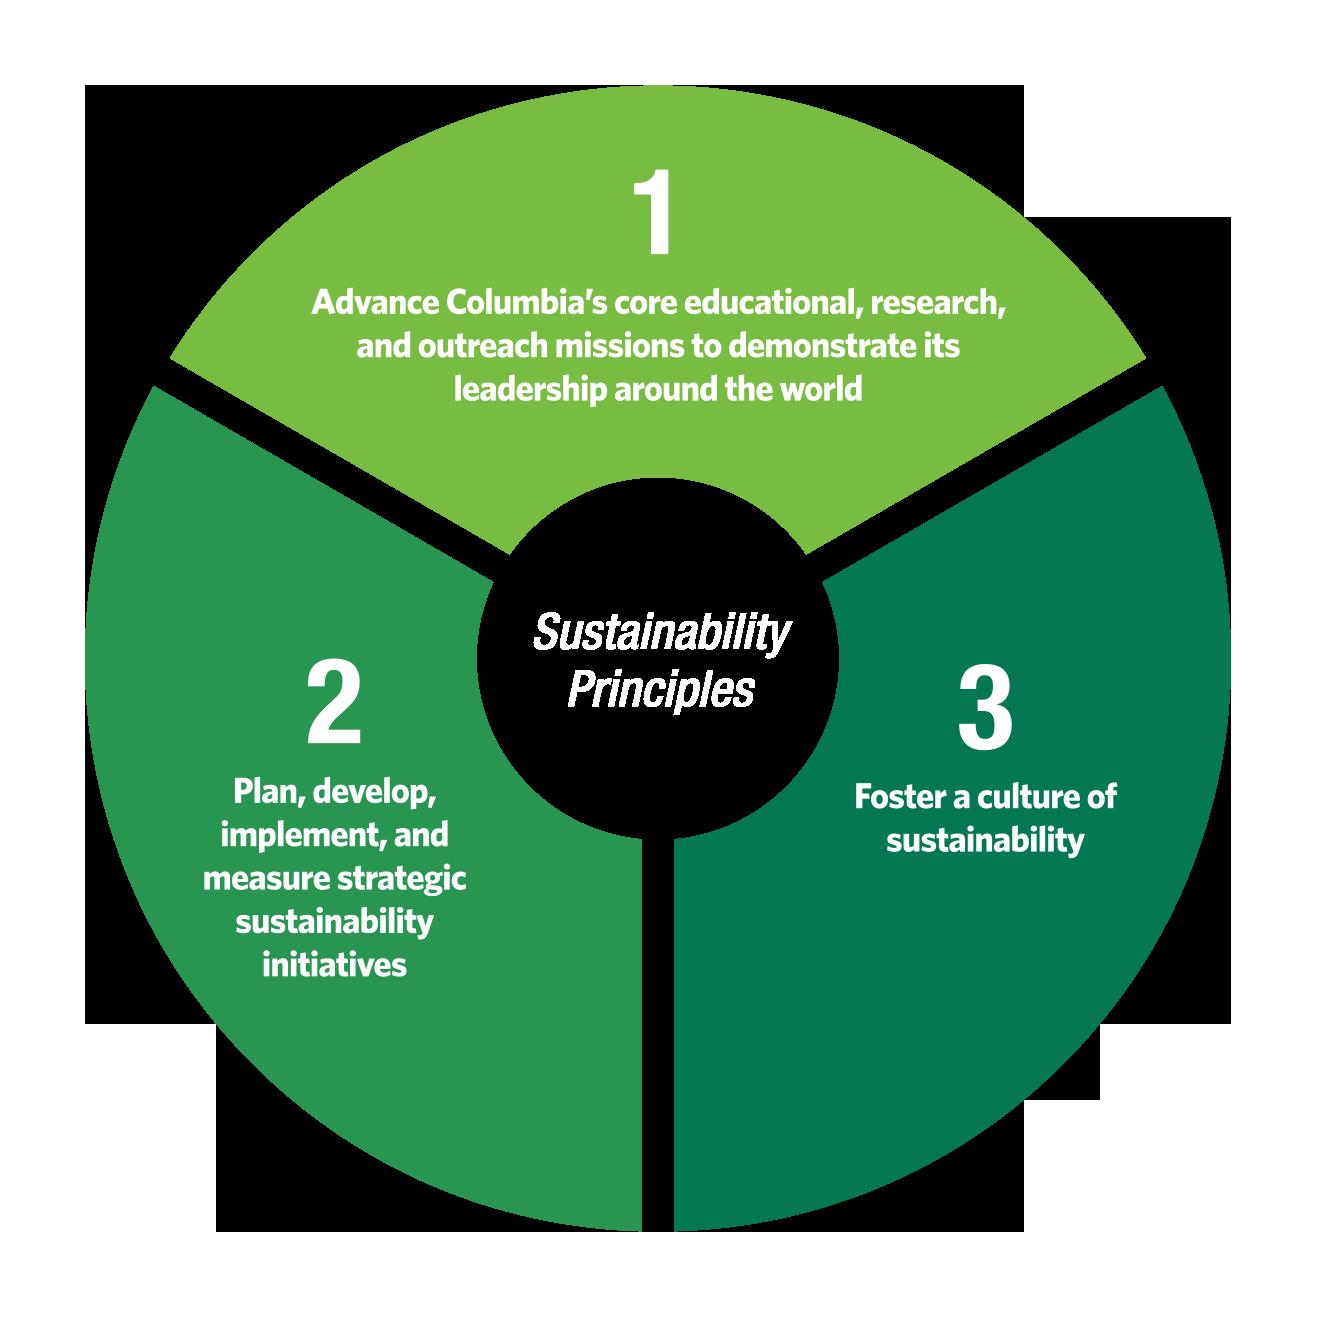 sustainability principles sustainable columbia